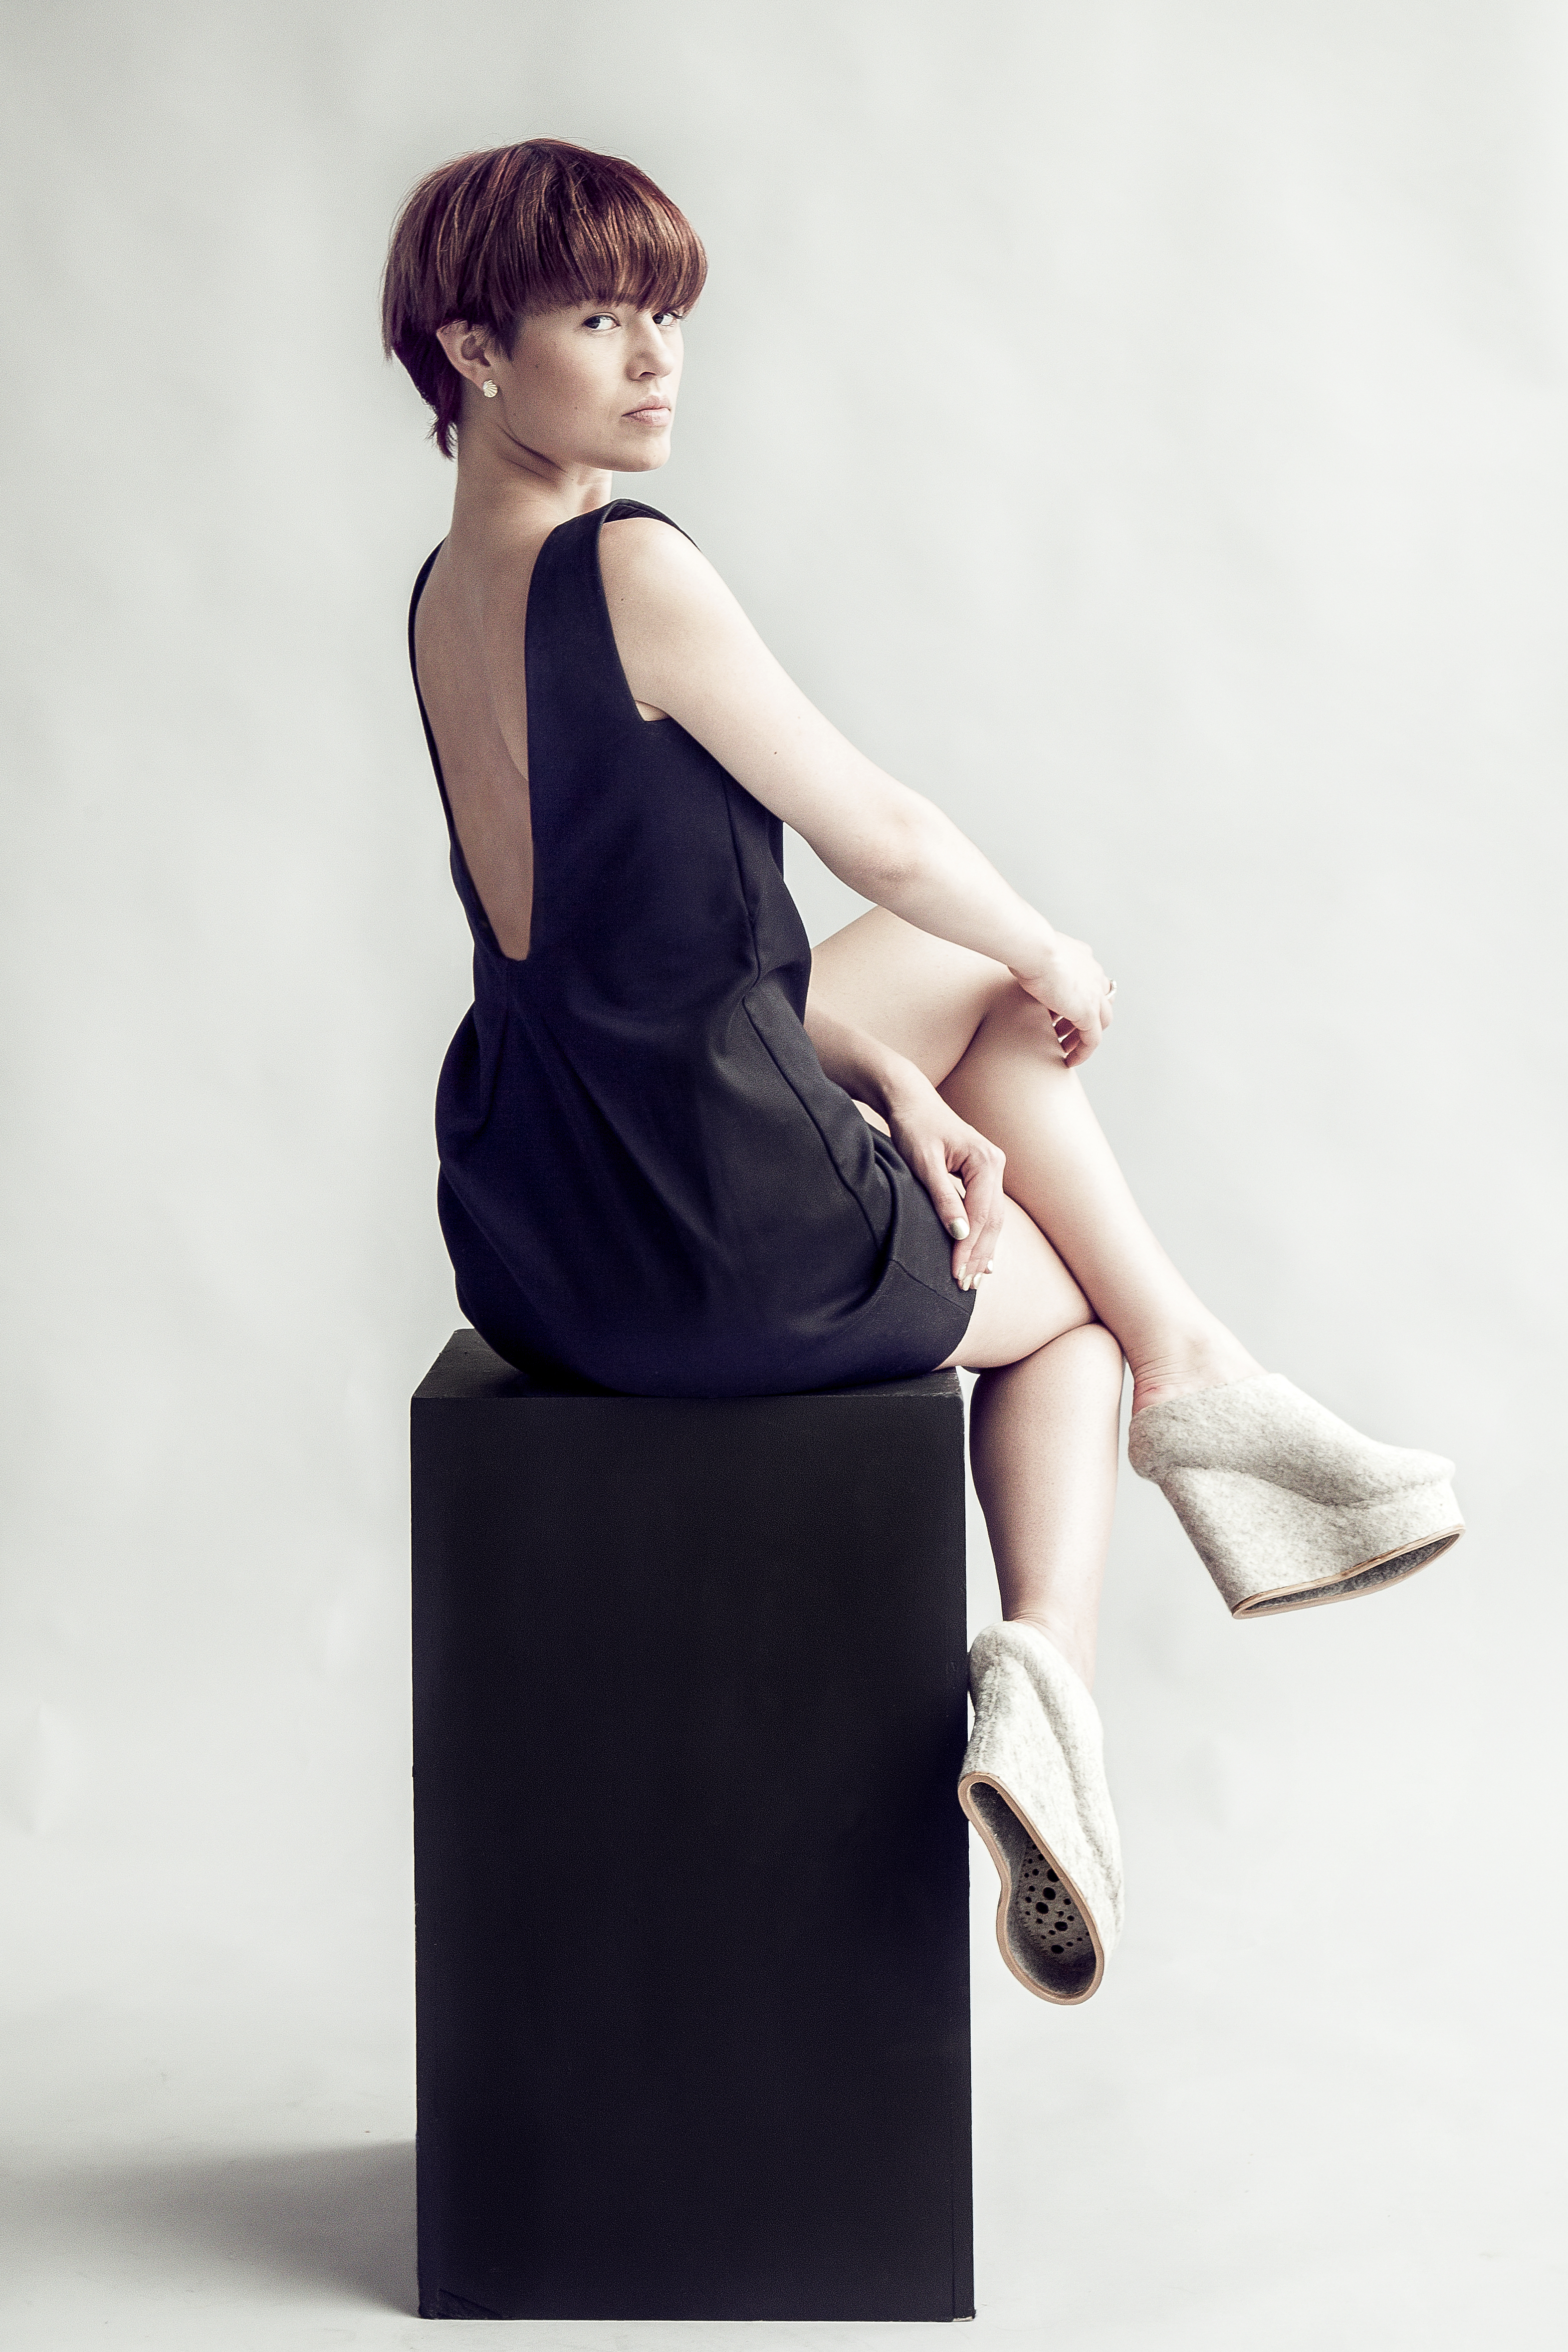 Liz Ciokajlo S Eco Futuristic Shoes Ozonweb By Ozon Magazine